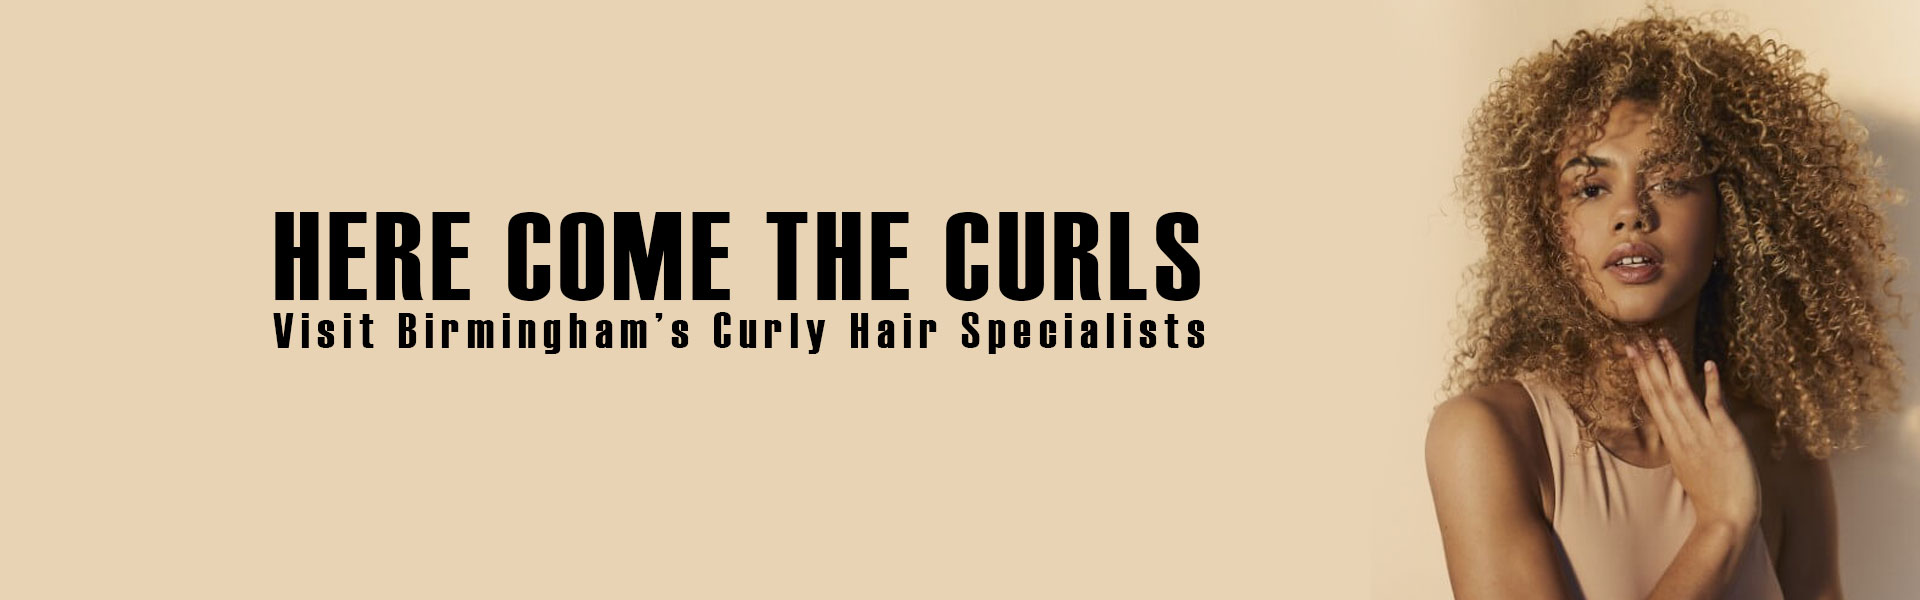 curly hair experts Birmingham